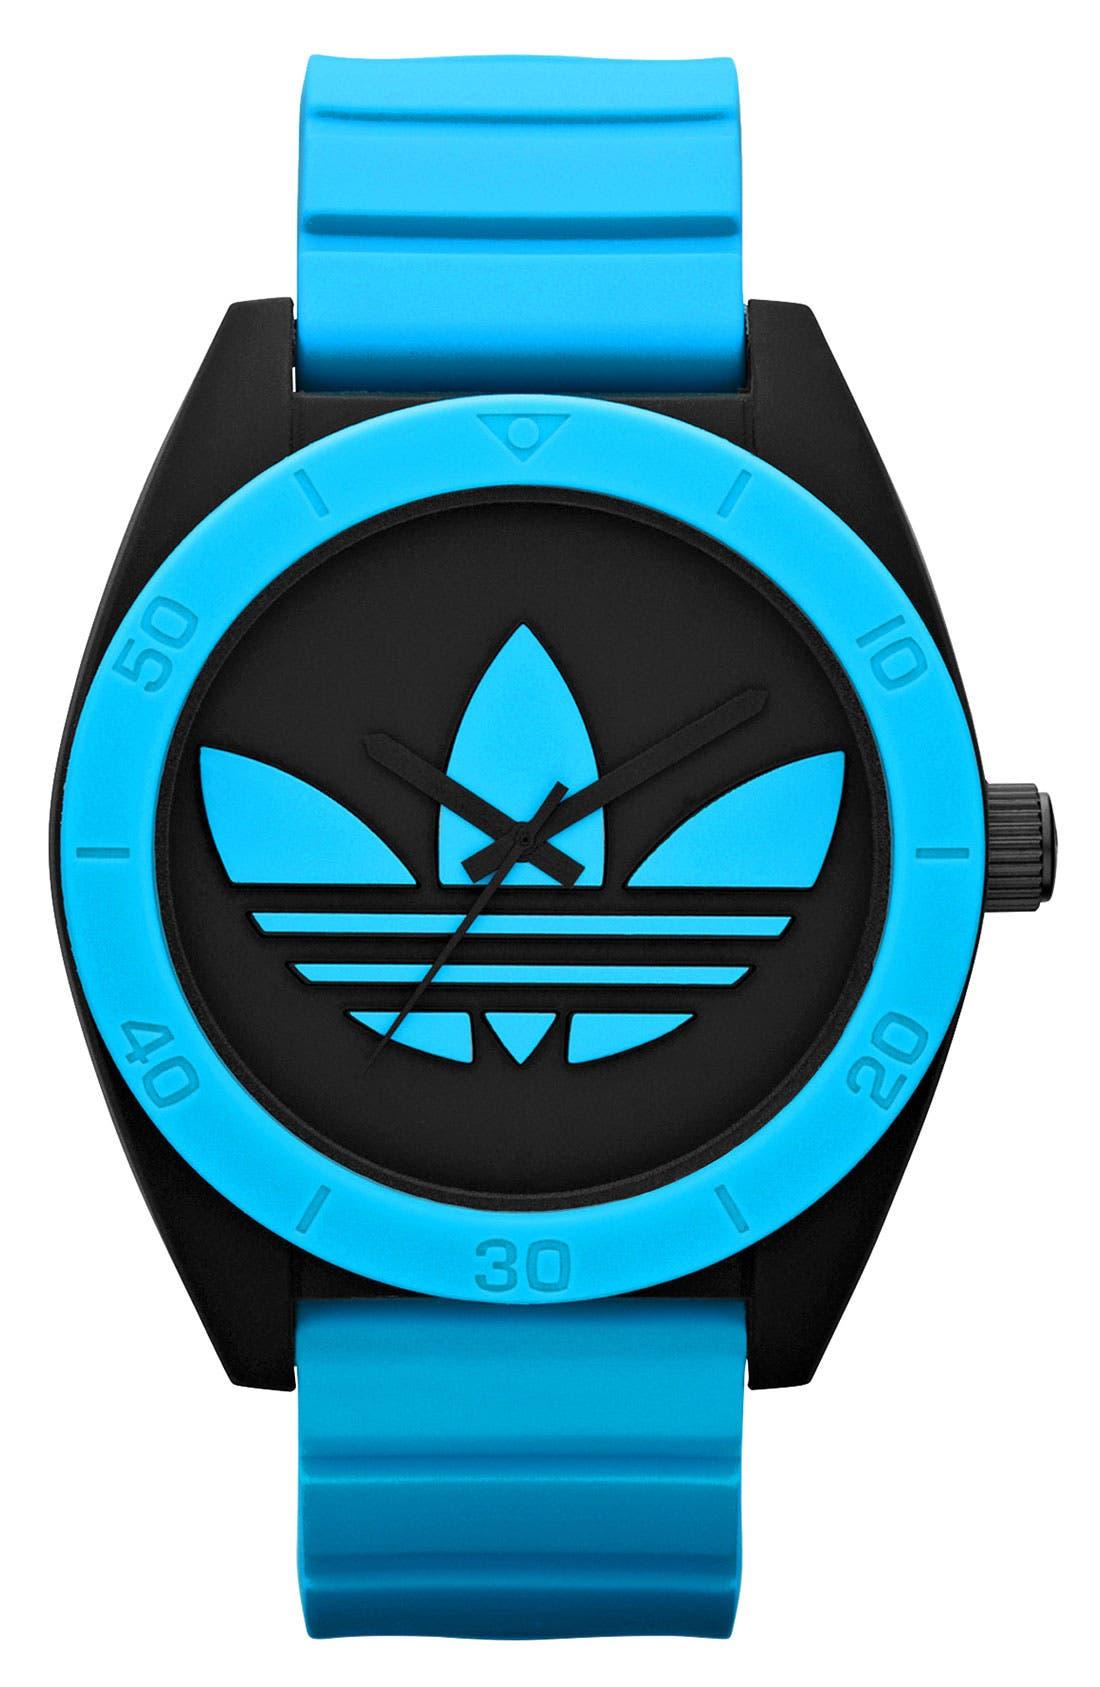 Alternate Image 1 Selected - adidas Originals 'Santiago XL' Neon Accent Watch, 50mm